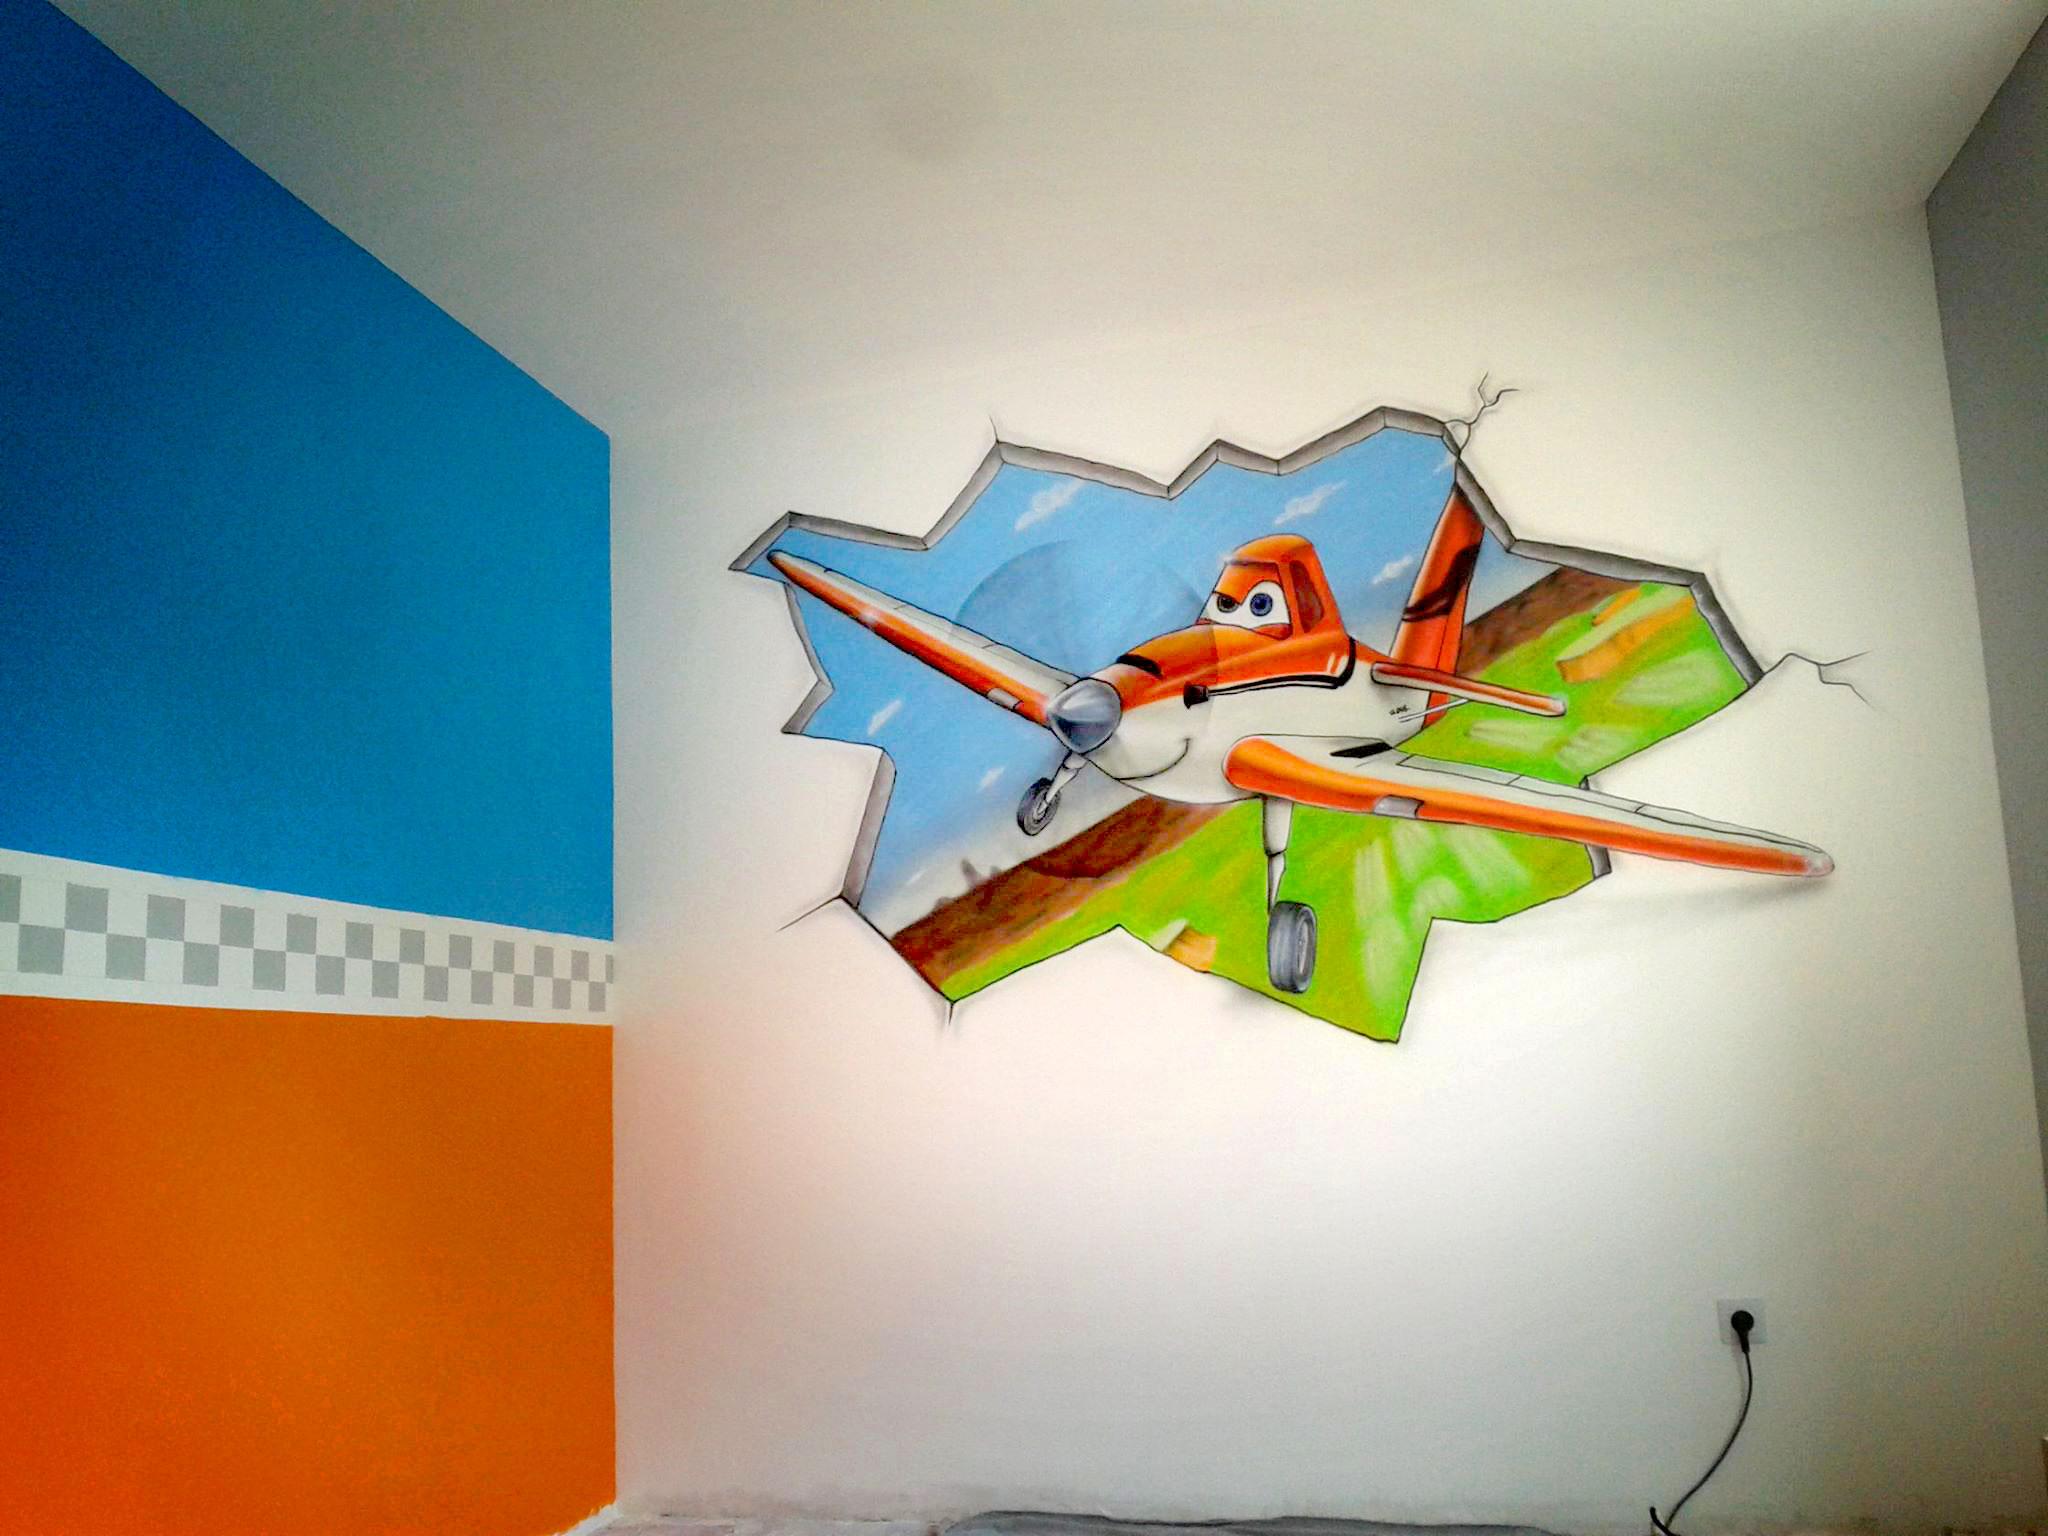 geograffeur-plane-cars-chambre-decoration-graffiti-enfant